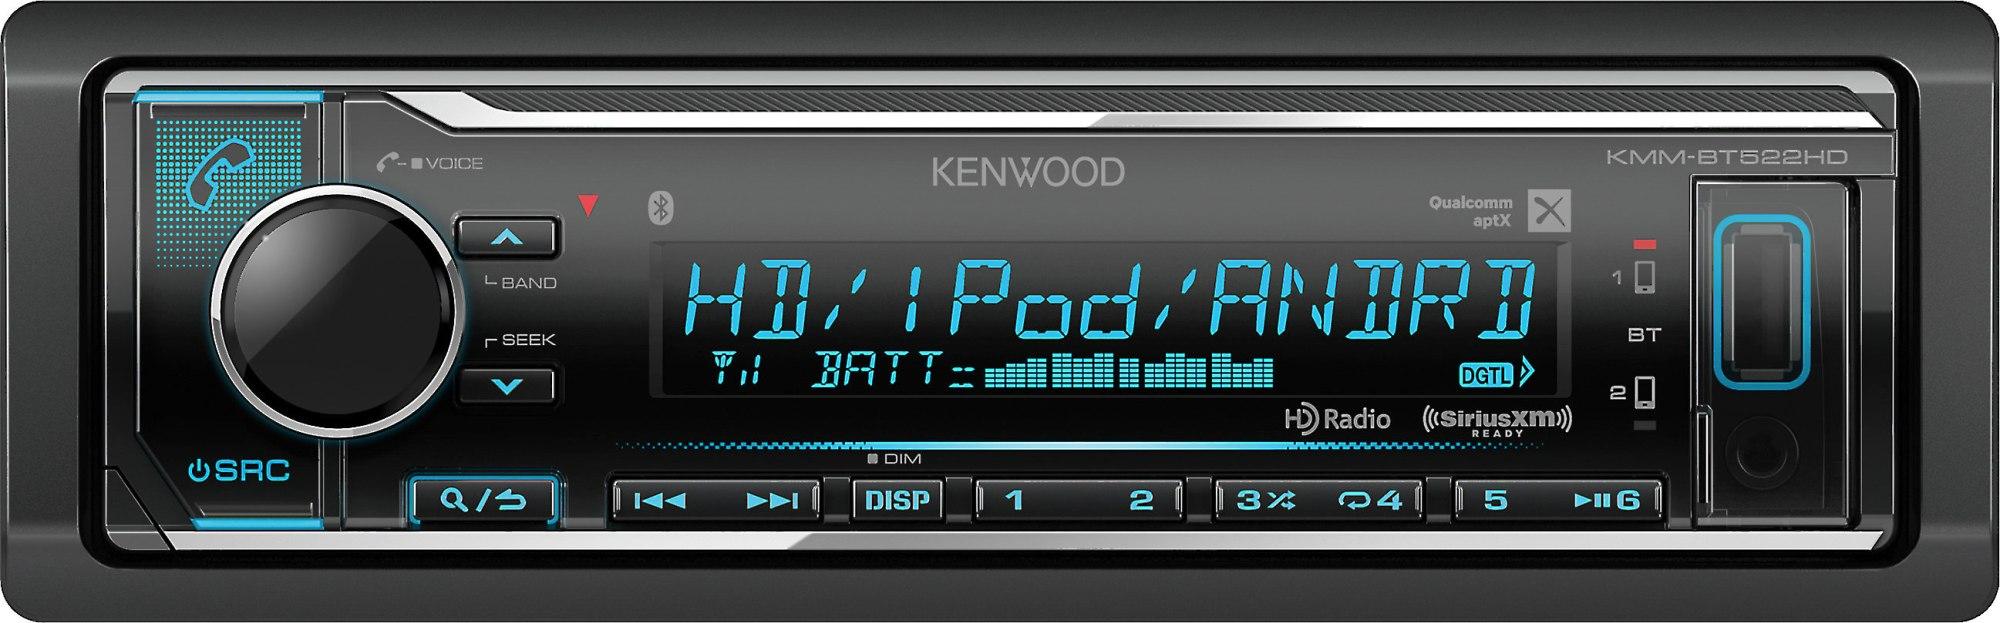 hight resolution of kenwood kmm bt522hd digital media receiver does not play cds at crutchfield